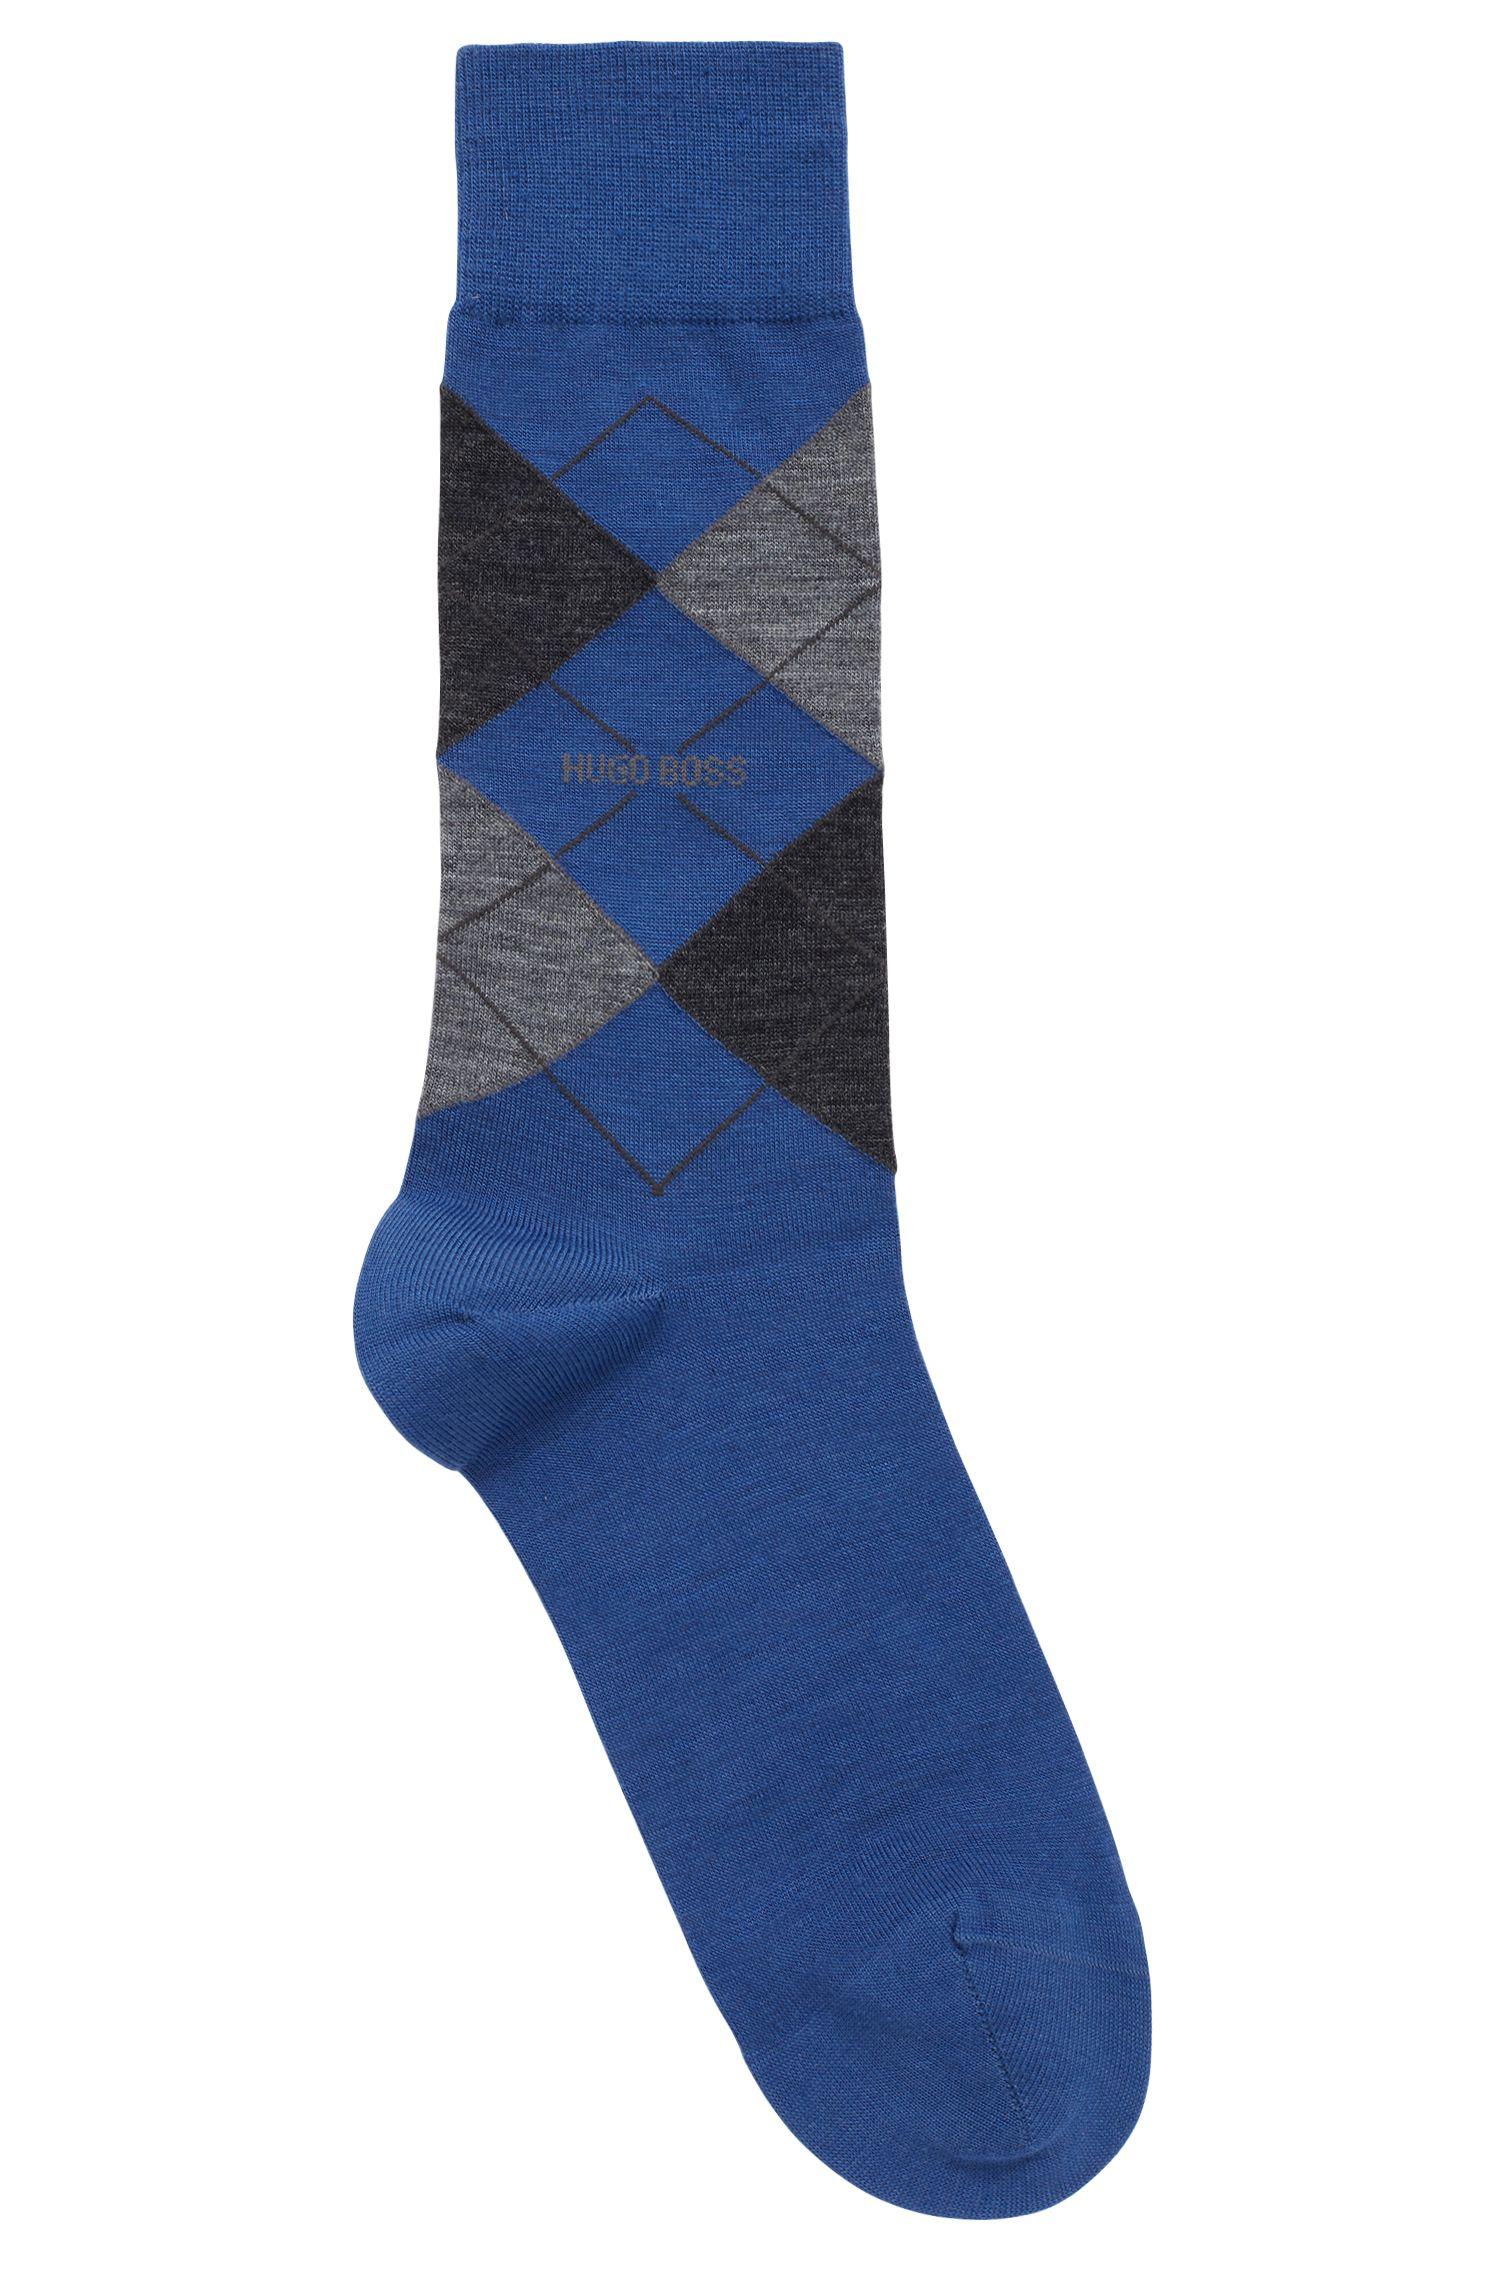 Calcetines de largo normal en mezcla de lana con motivo de rombos, Azul